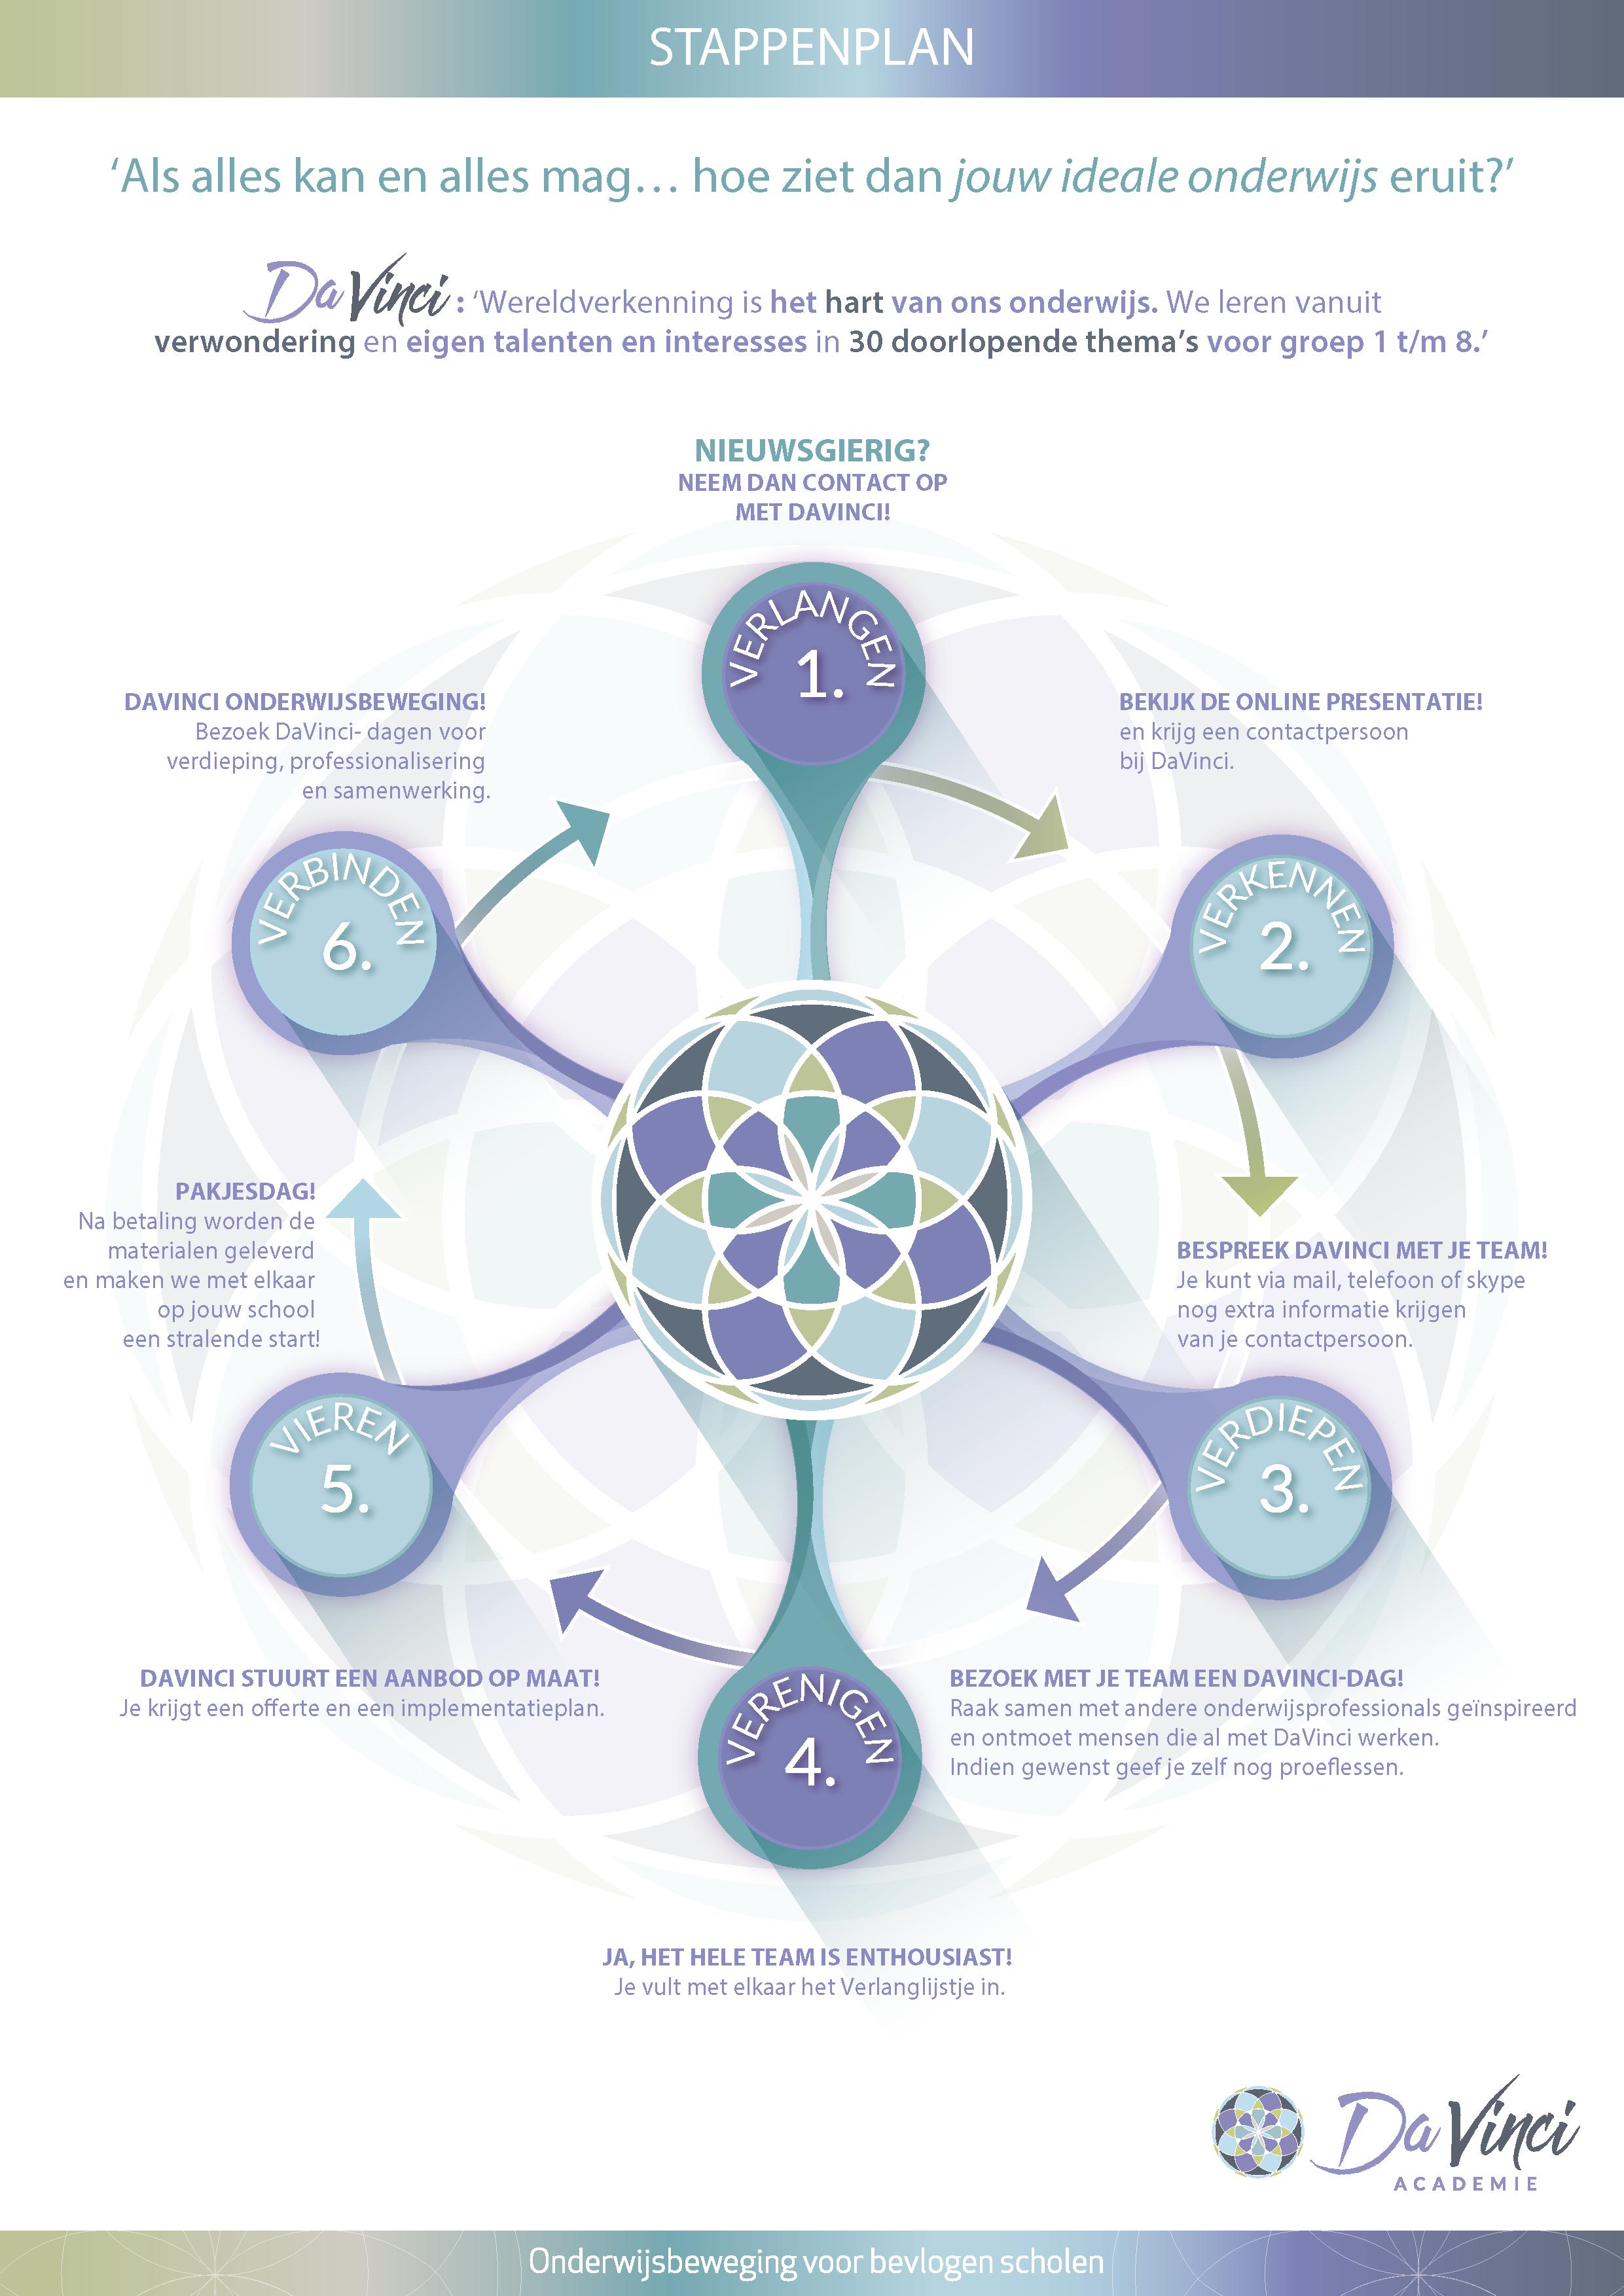 wereldverkenning implementatie stappenplan DaVinci methode